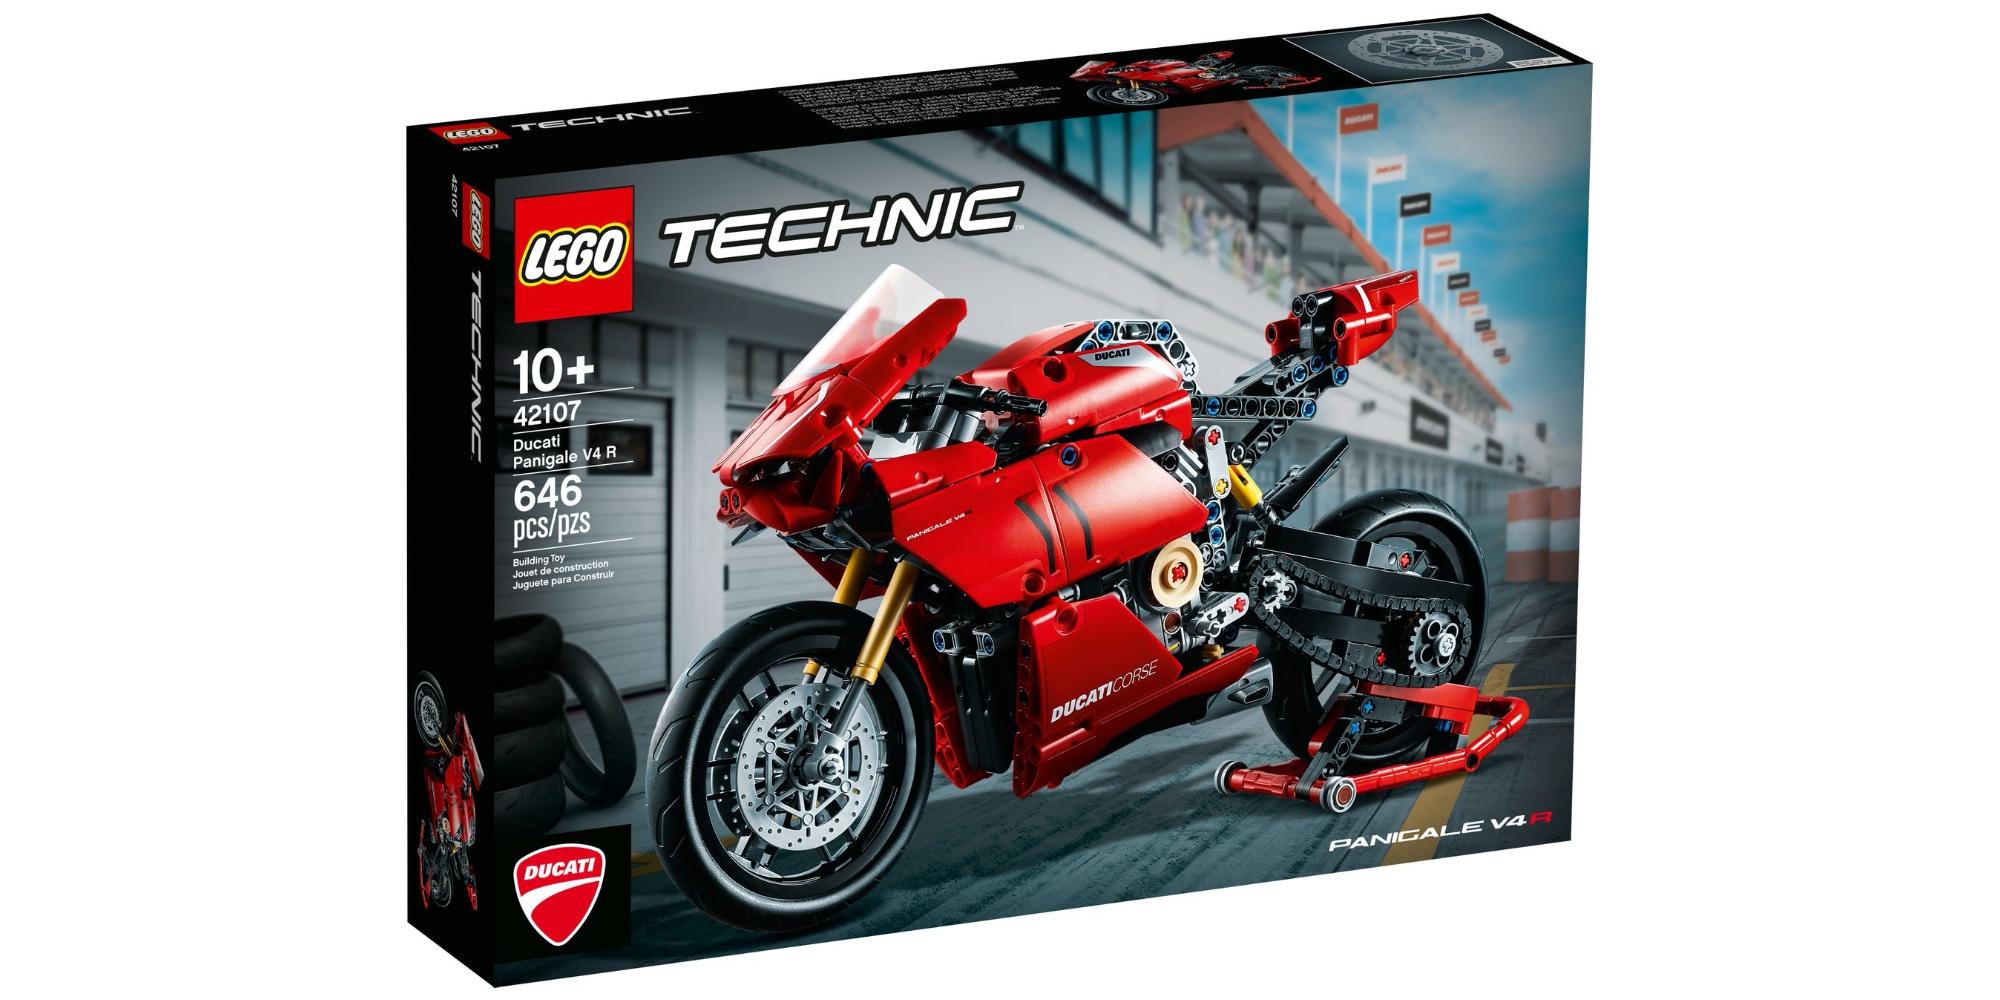 LEGO Technic Ducati